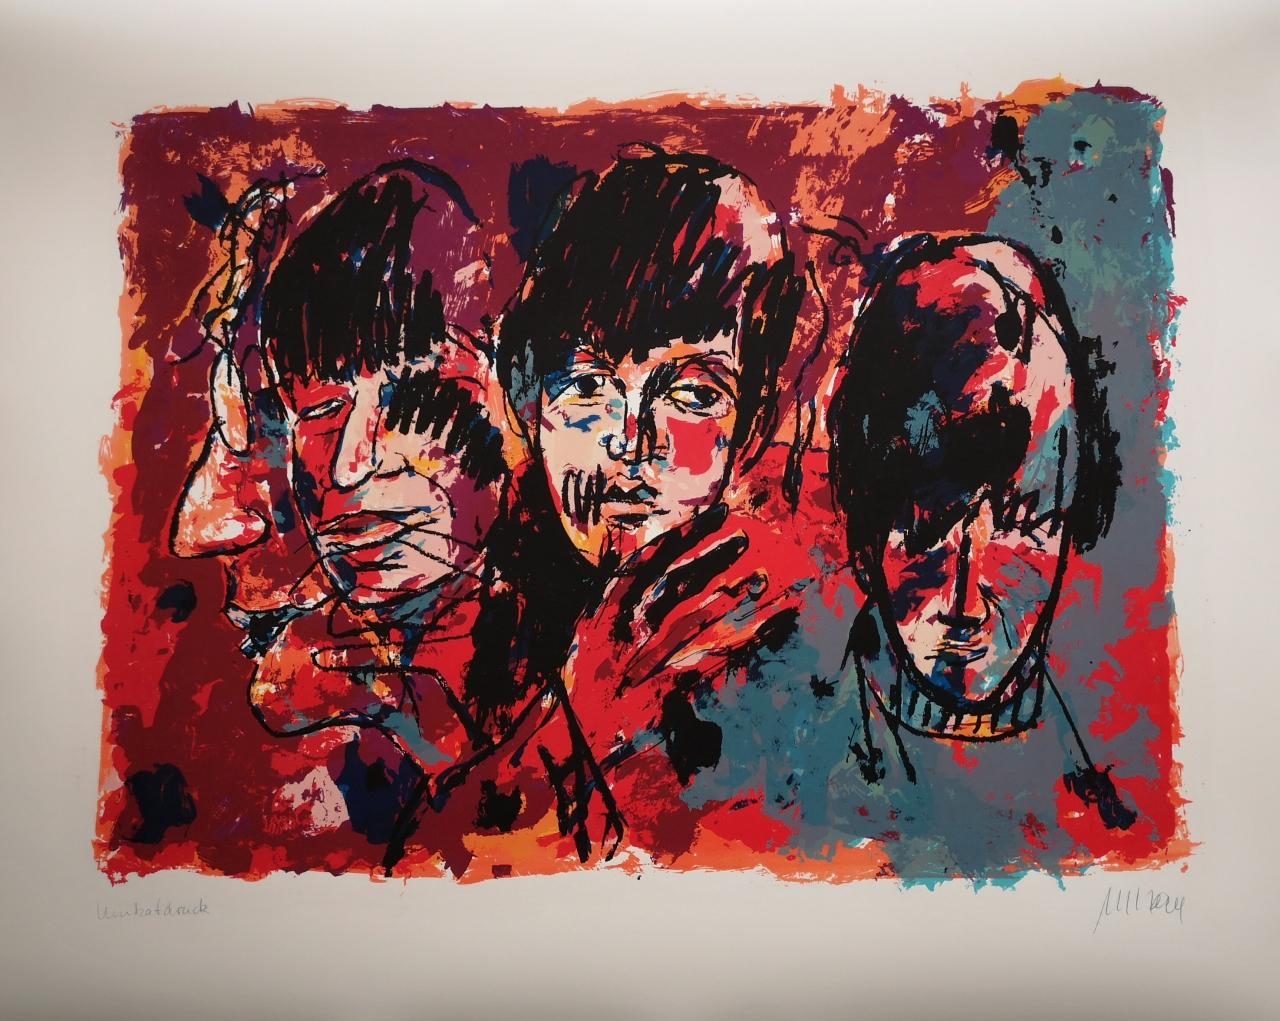 The Beatles - Unikatdruck - No. XIV - Variante Rot-Orange-Taubenblau